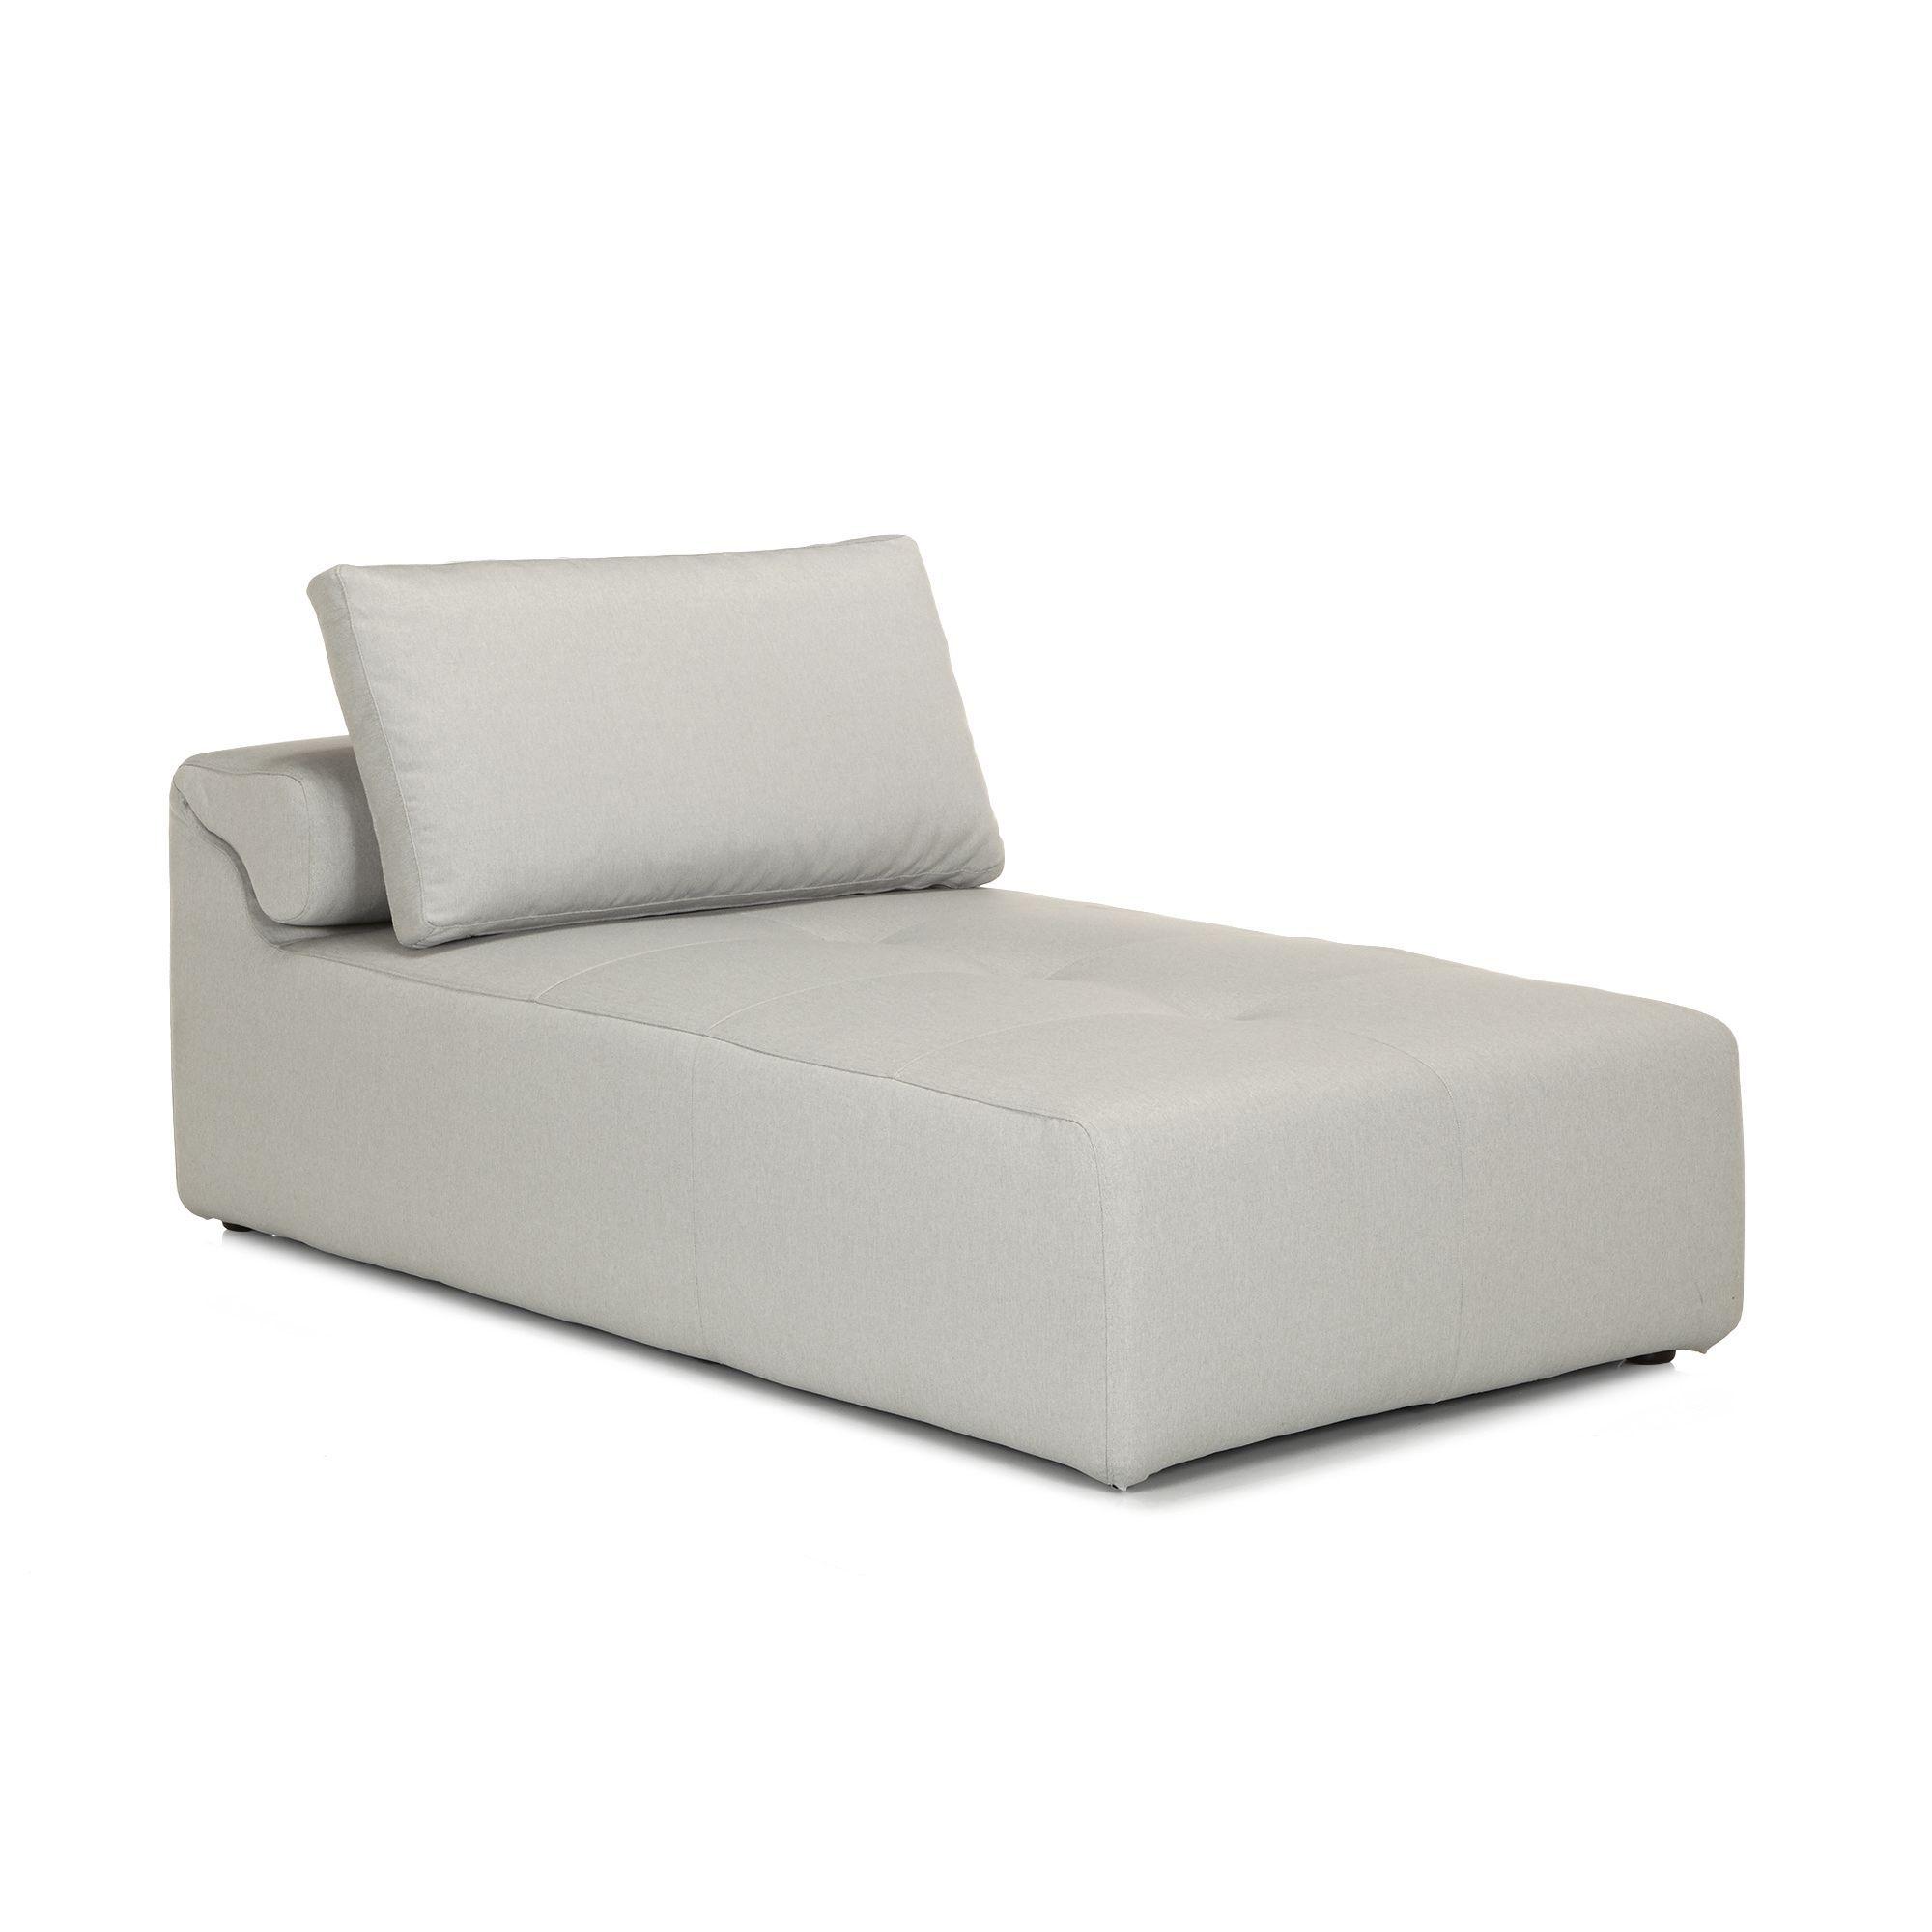 alinea meridienne. Black Bedroom Furniture Sets. Home Design Ideas